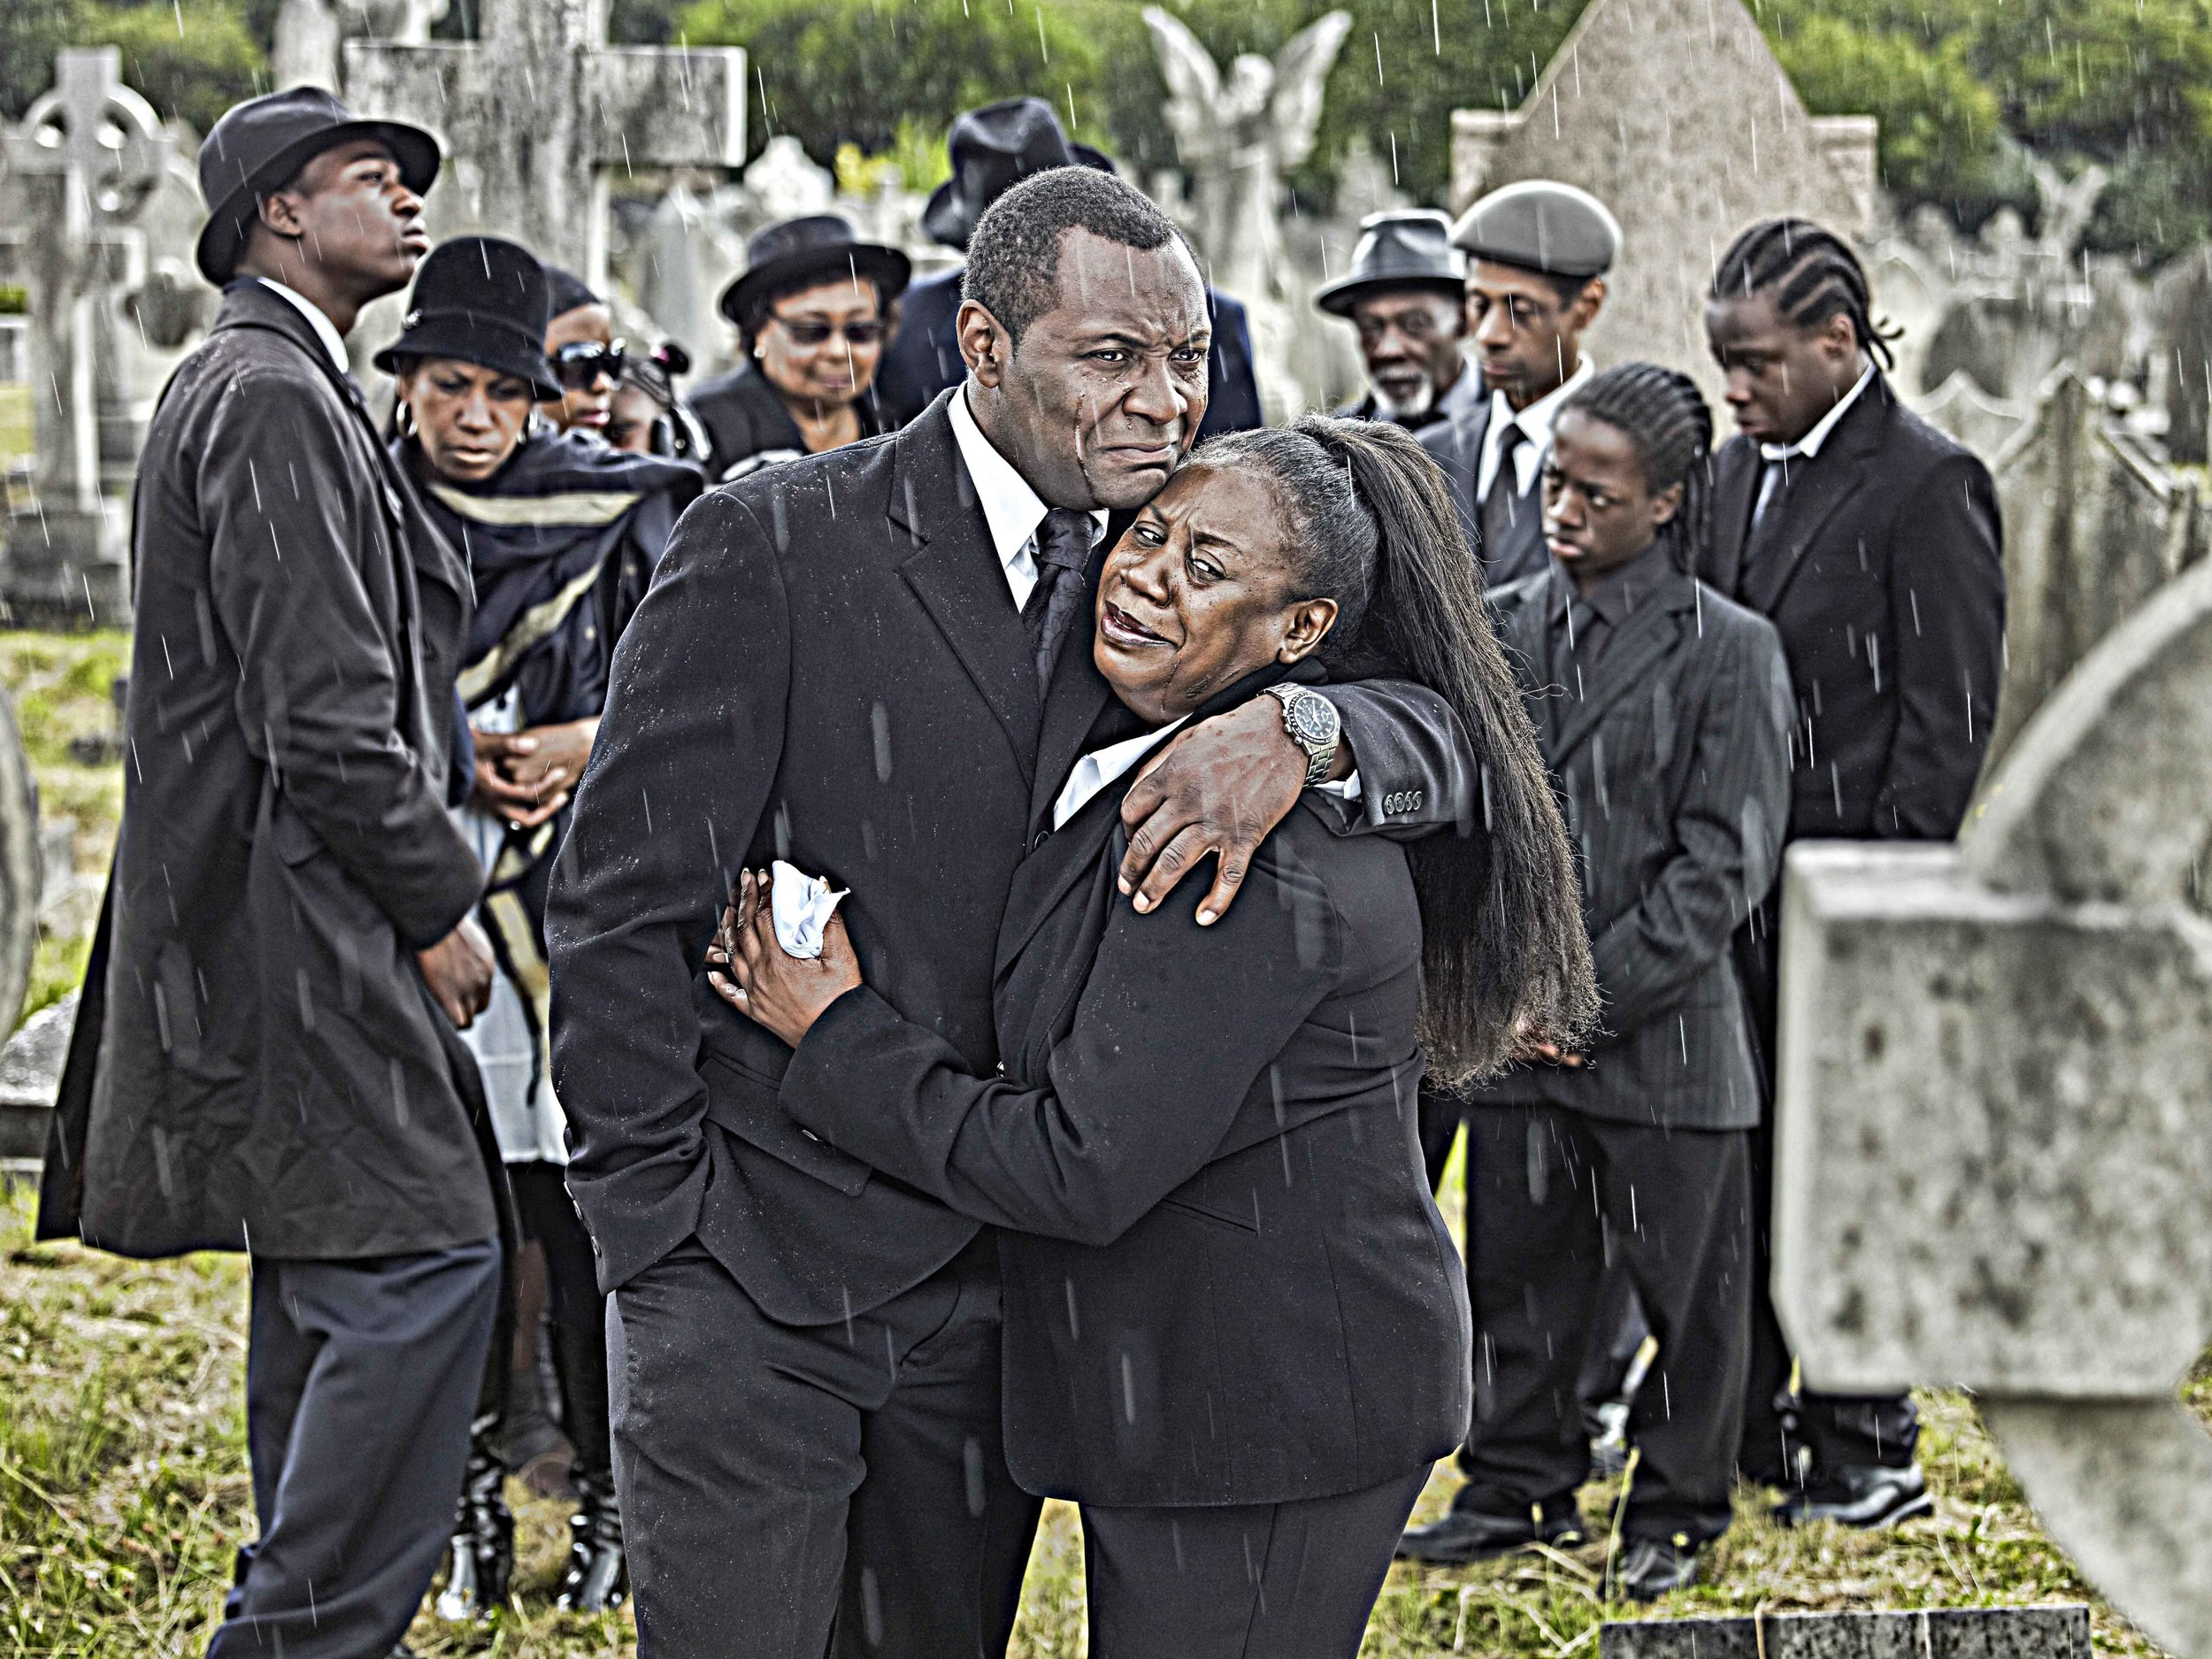 The Funeral- by John Ferguson